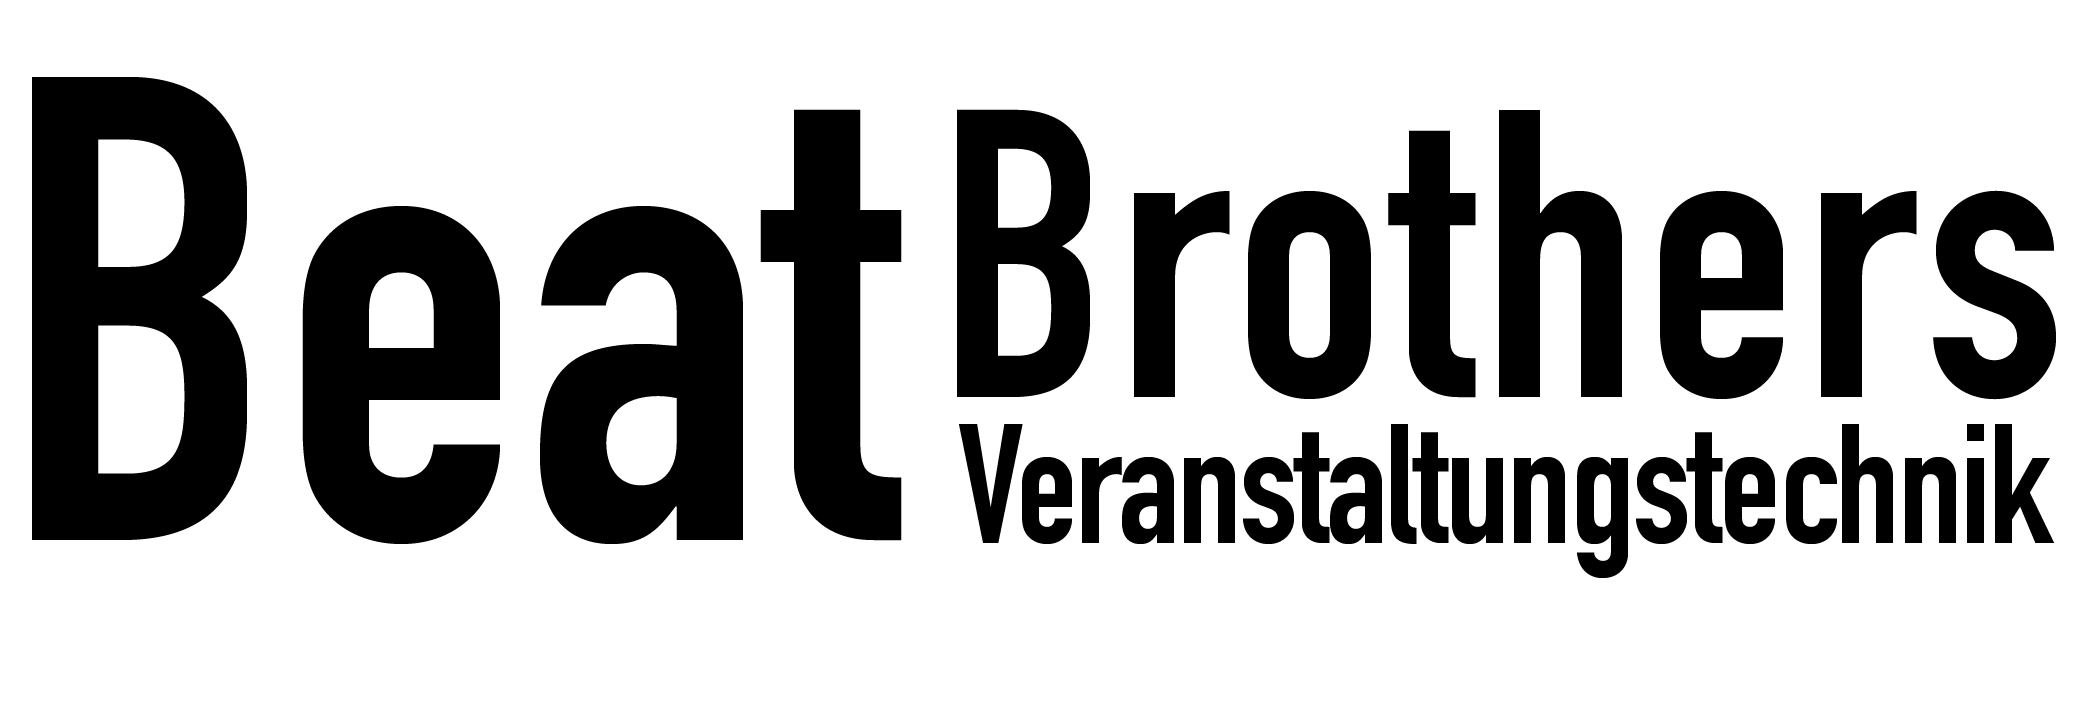 Beatbrothers Veranstaltungstechnik GbR